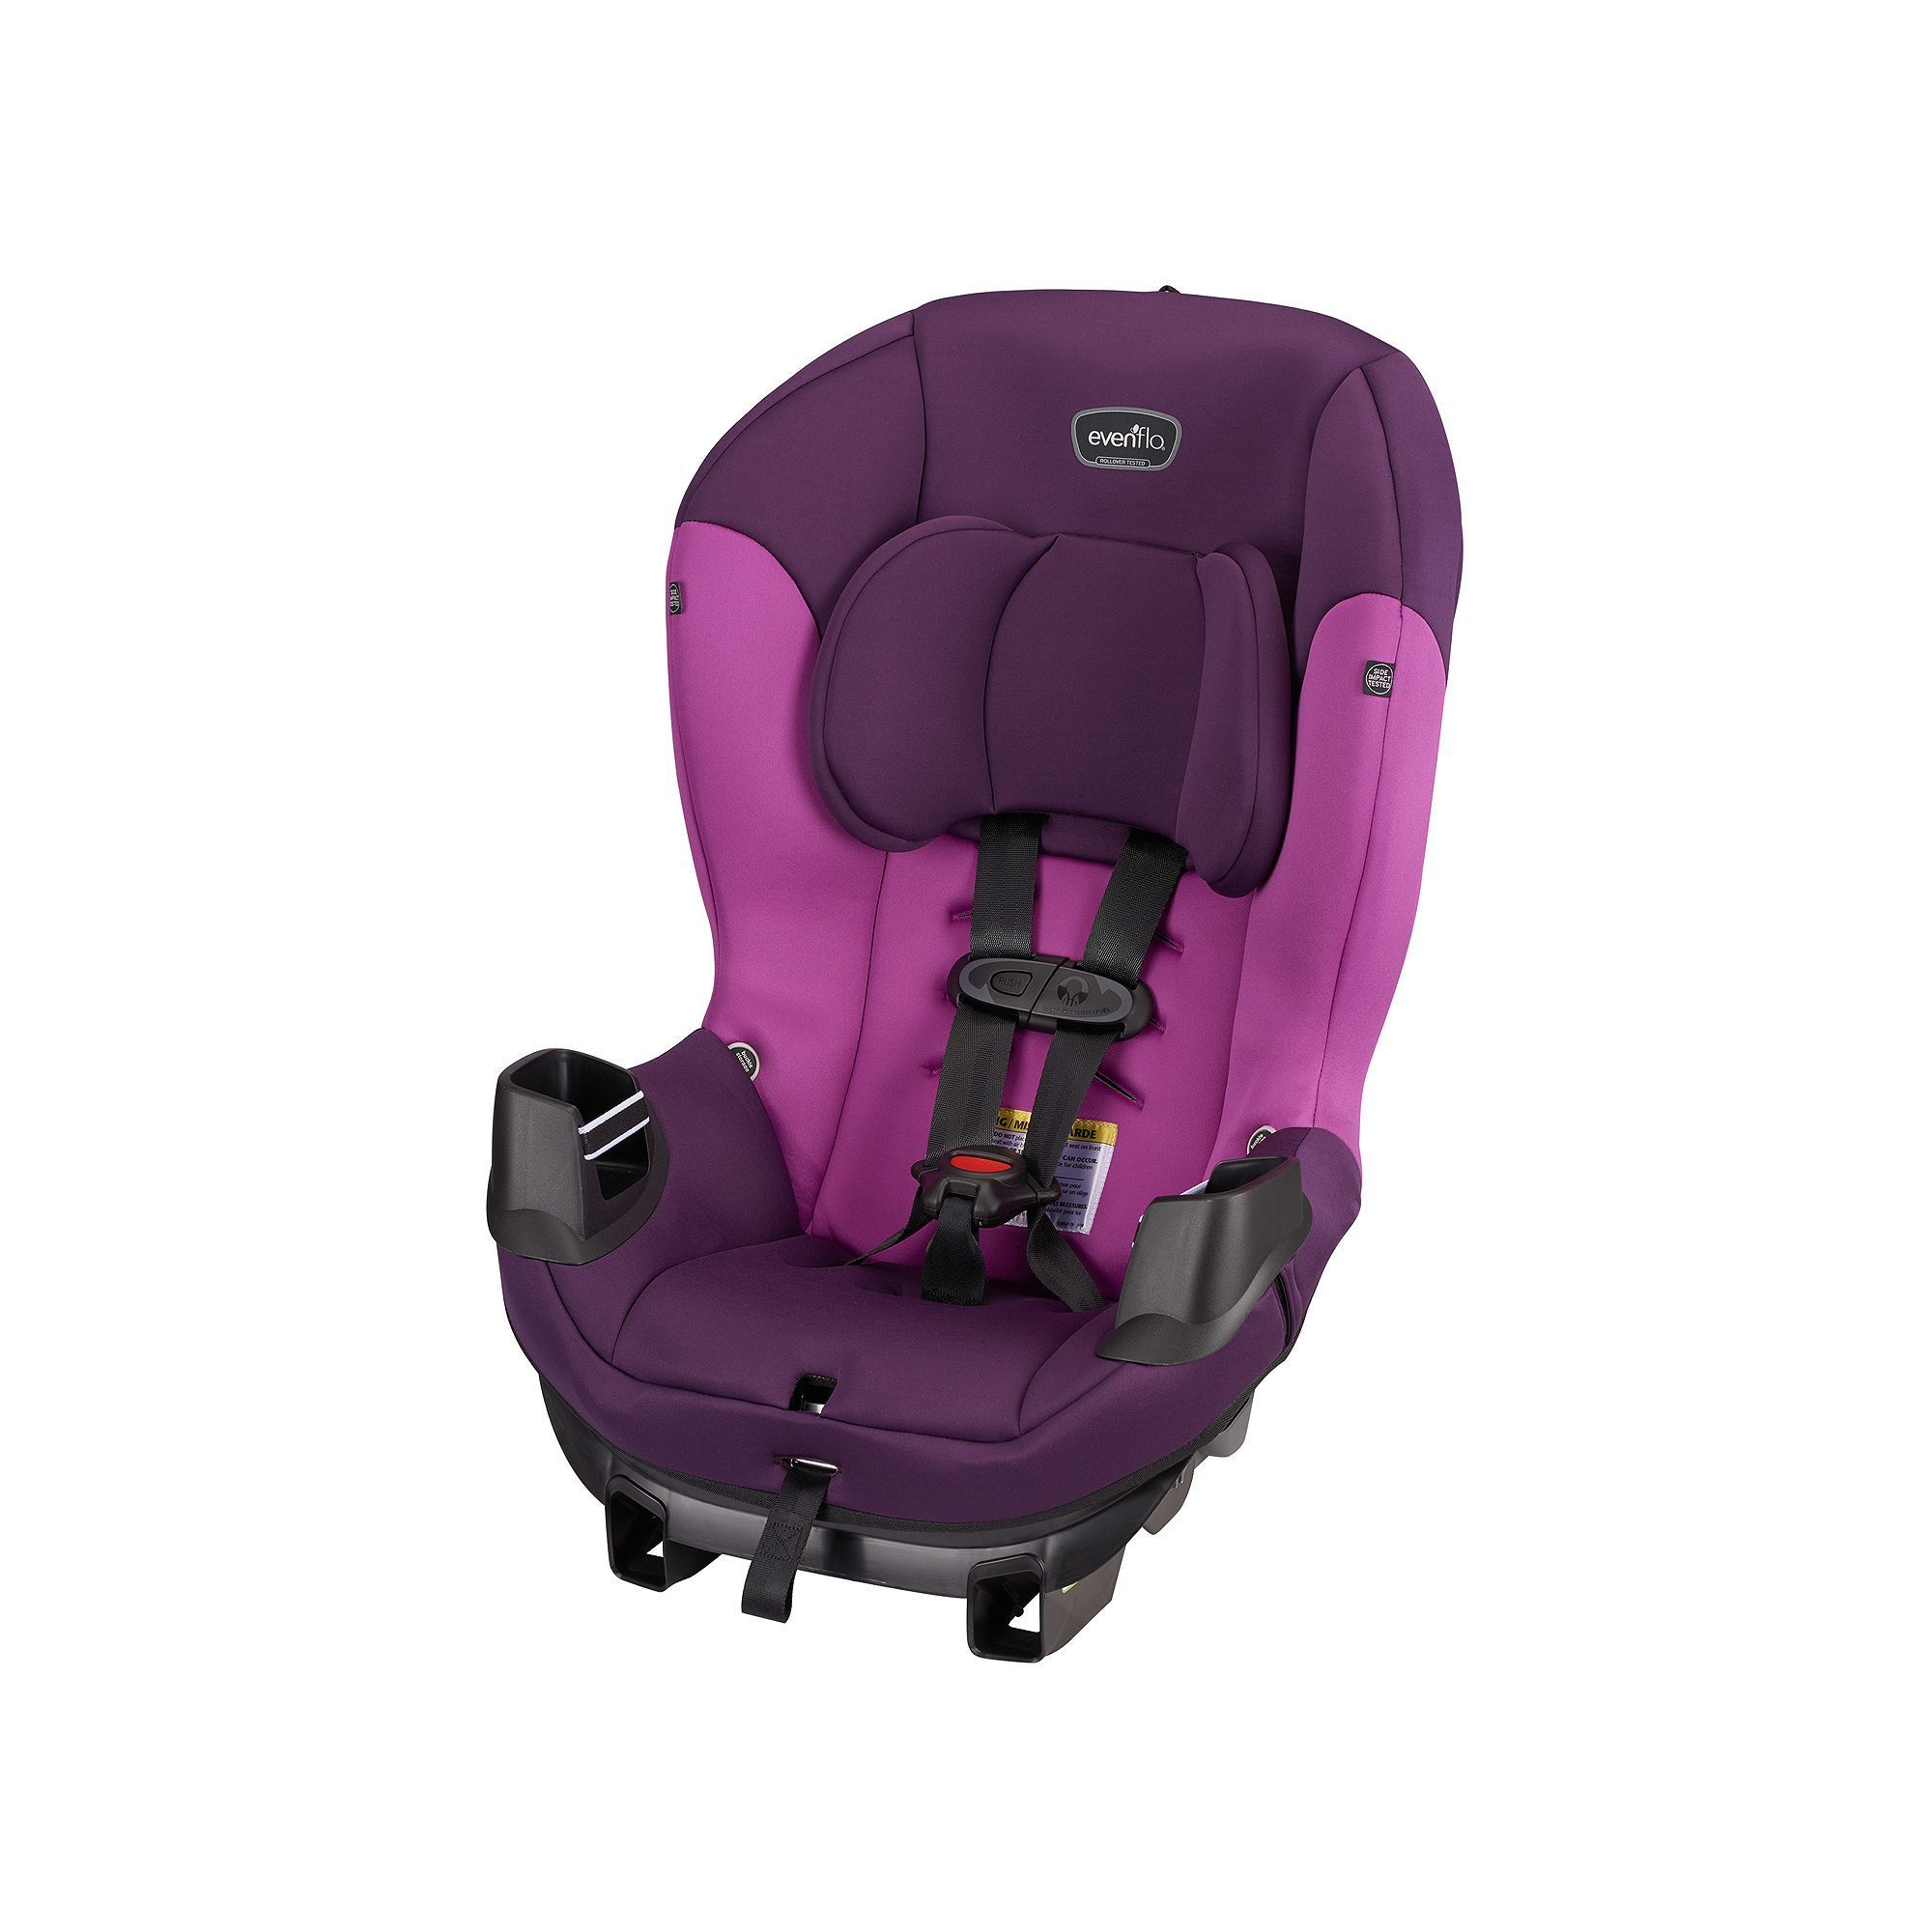 EvenFlo Sonus Convertible Car Seat, Multicolor Car seats